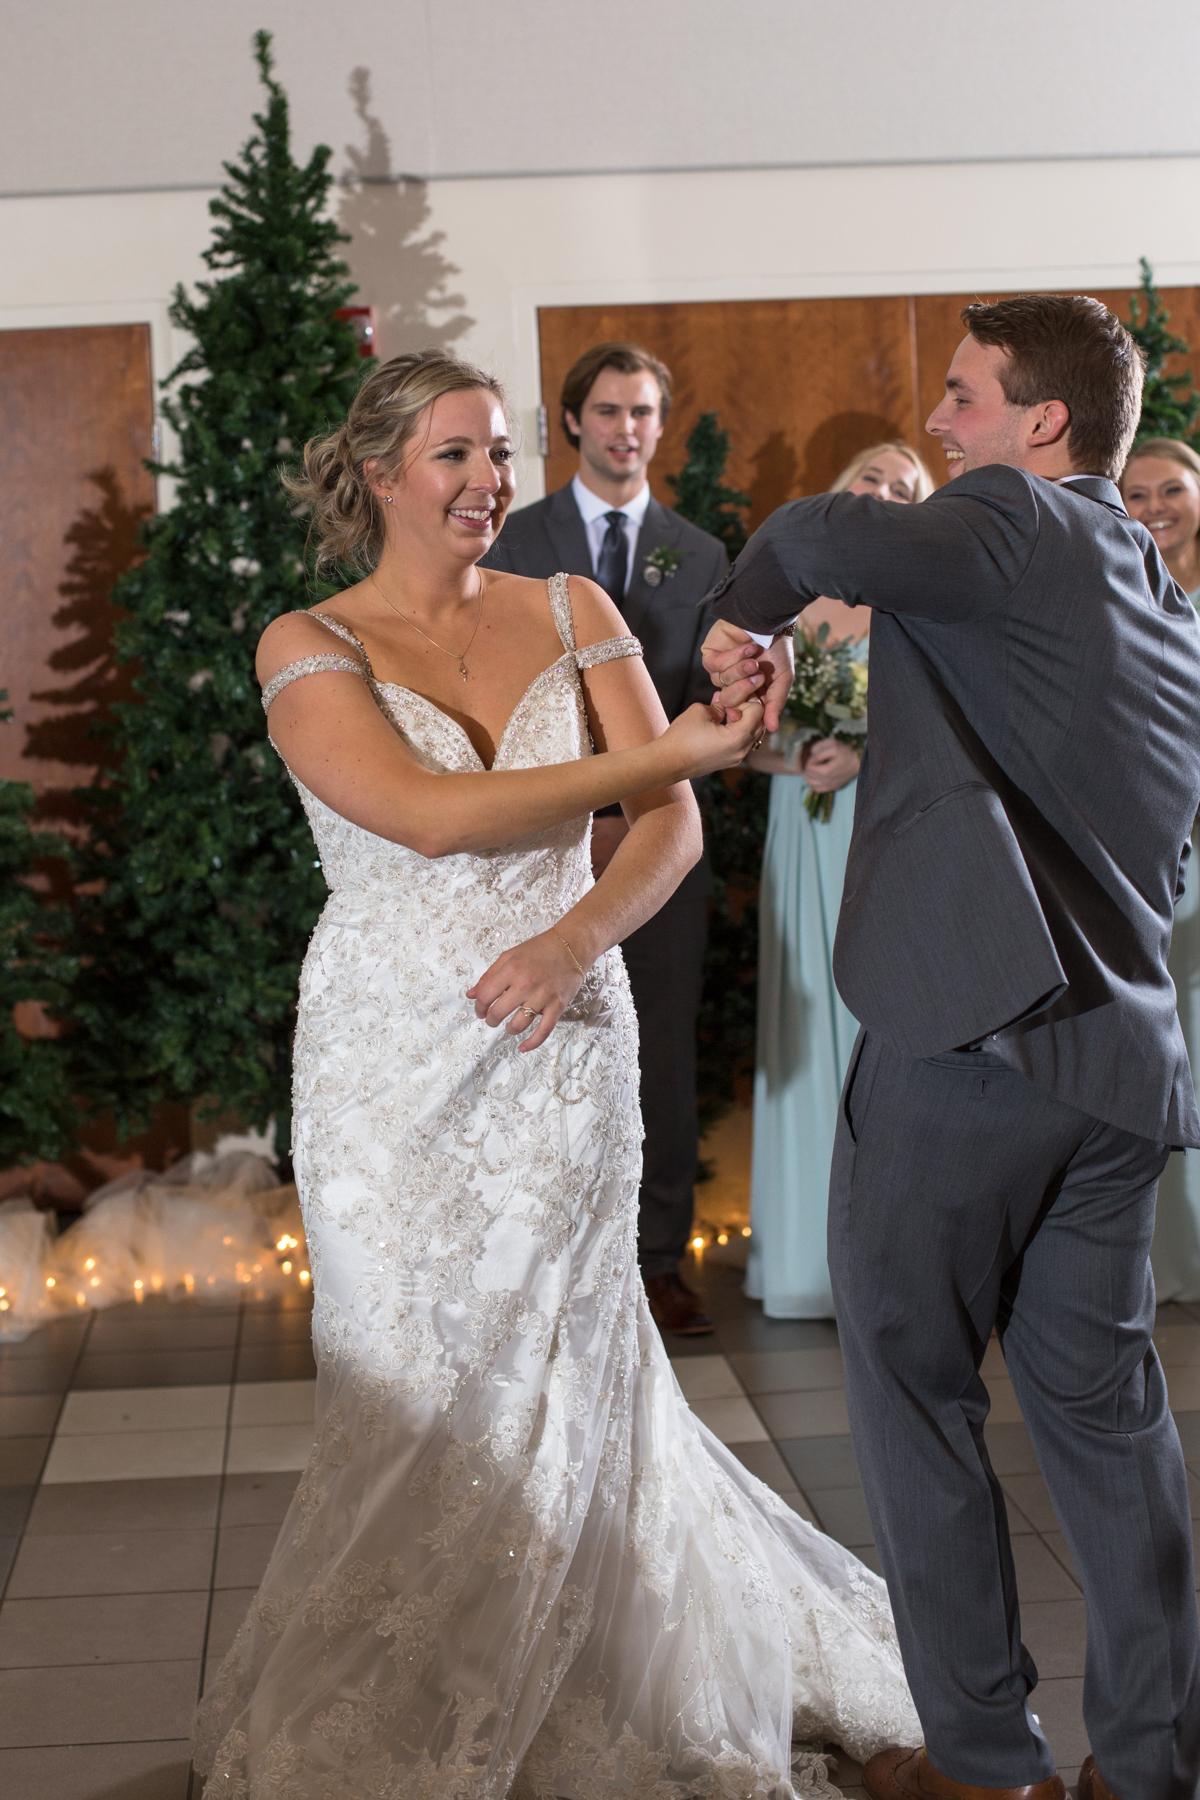 Kelli-and-Matt-Nashville-Wedding-Sneak-Peak-0272.jpg